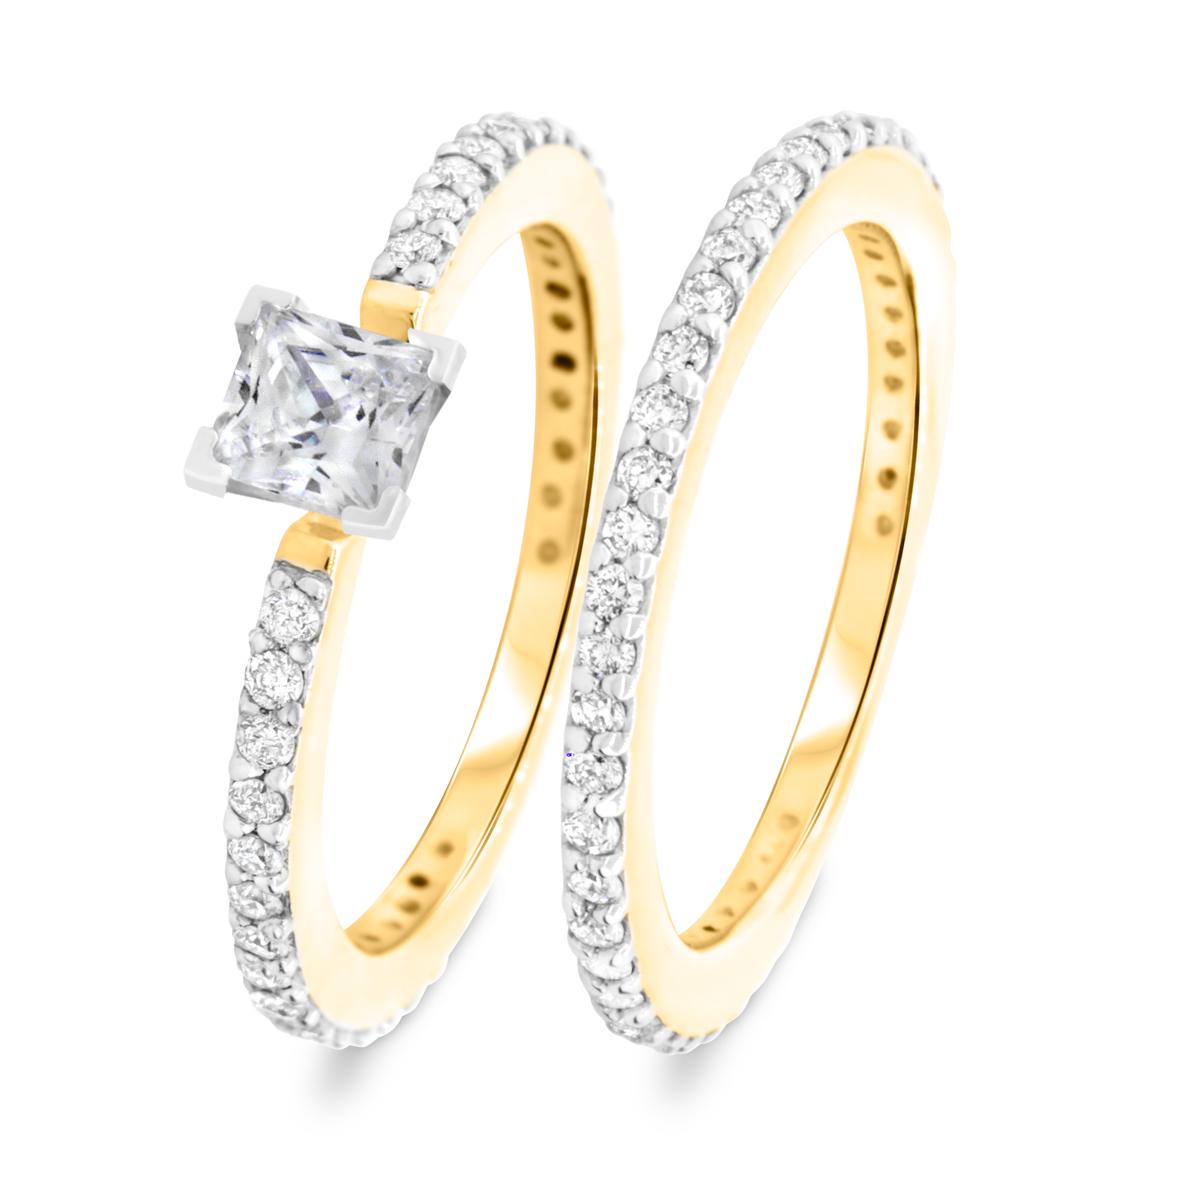 1 1/7 CT. T.W. Diamond Women's Bridal Wedding Ring Set 14K Yellow Gold